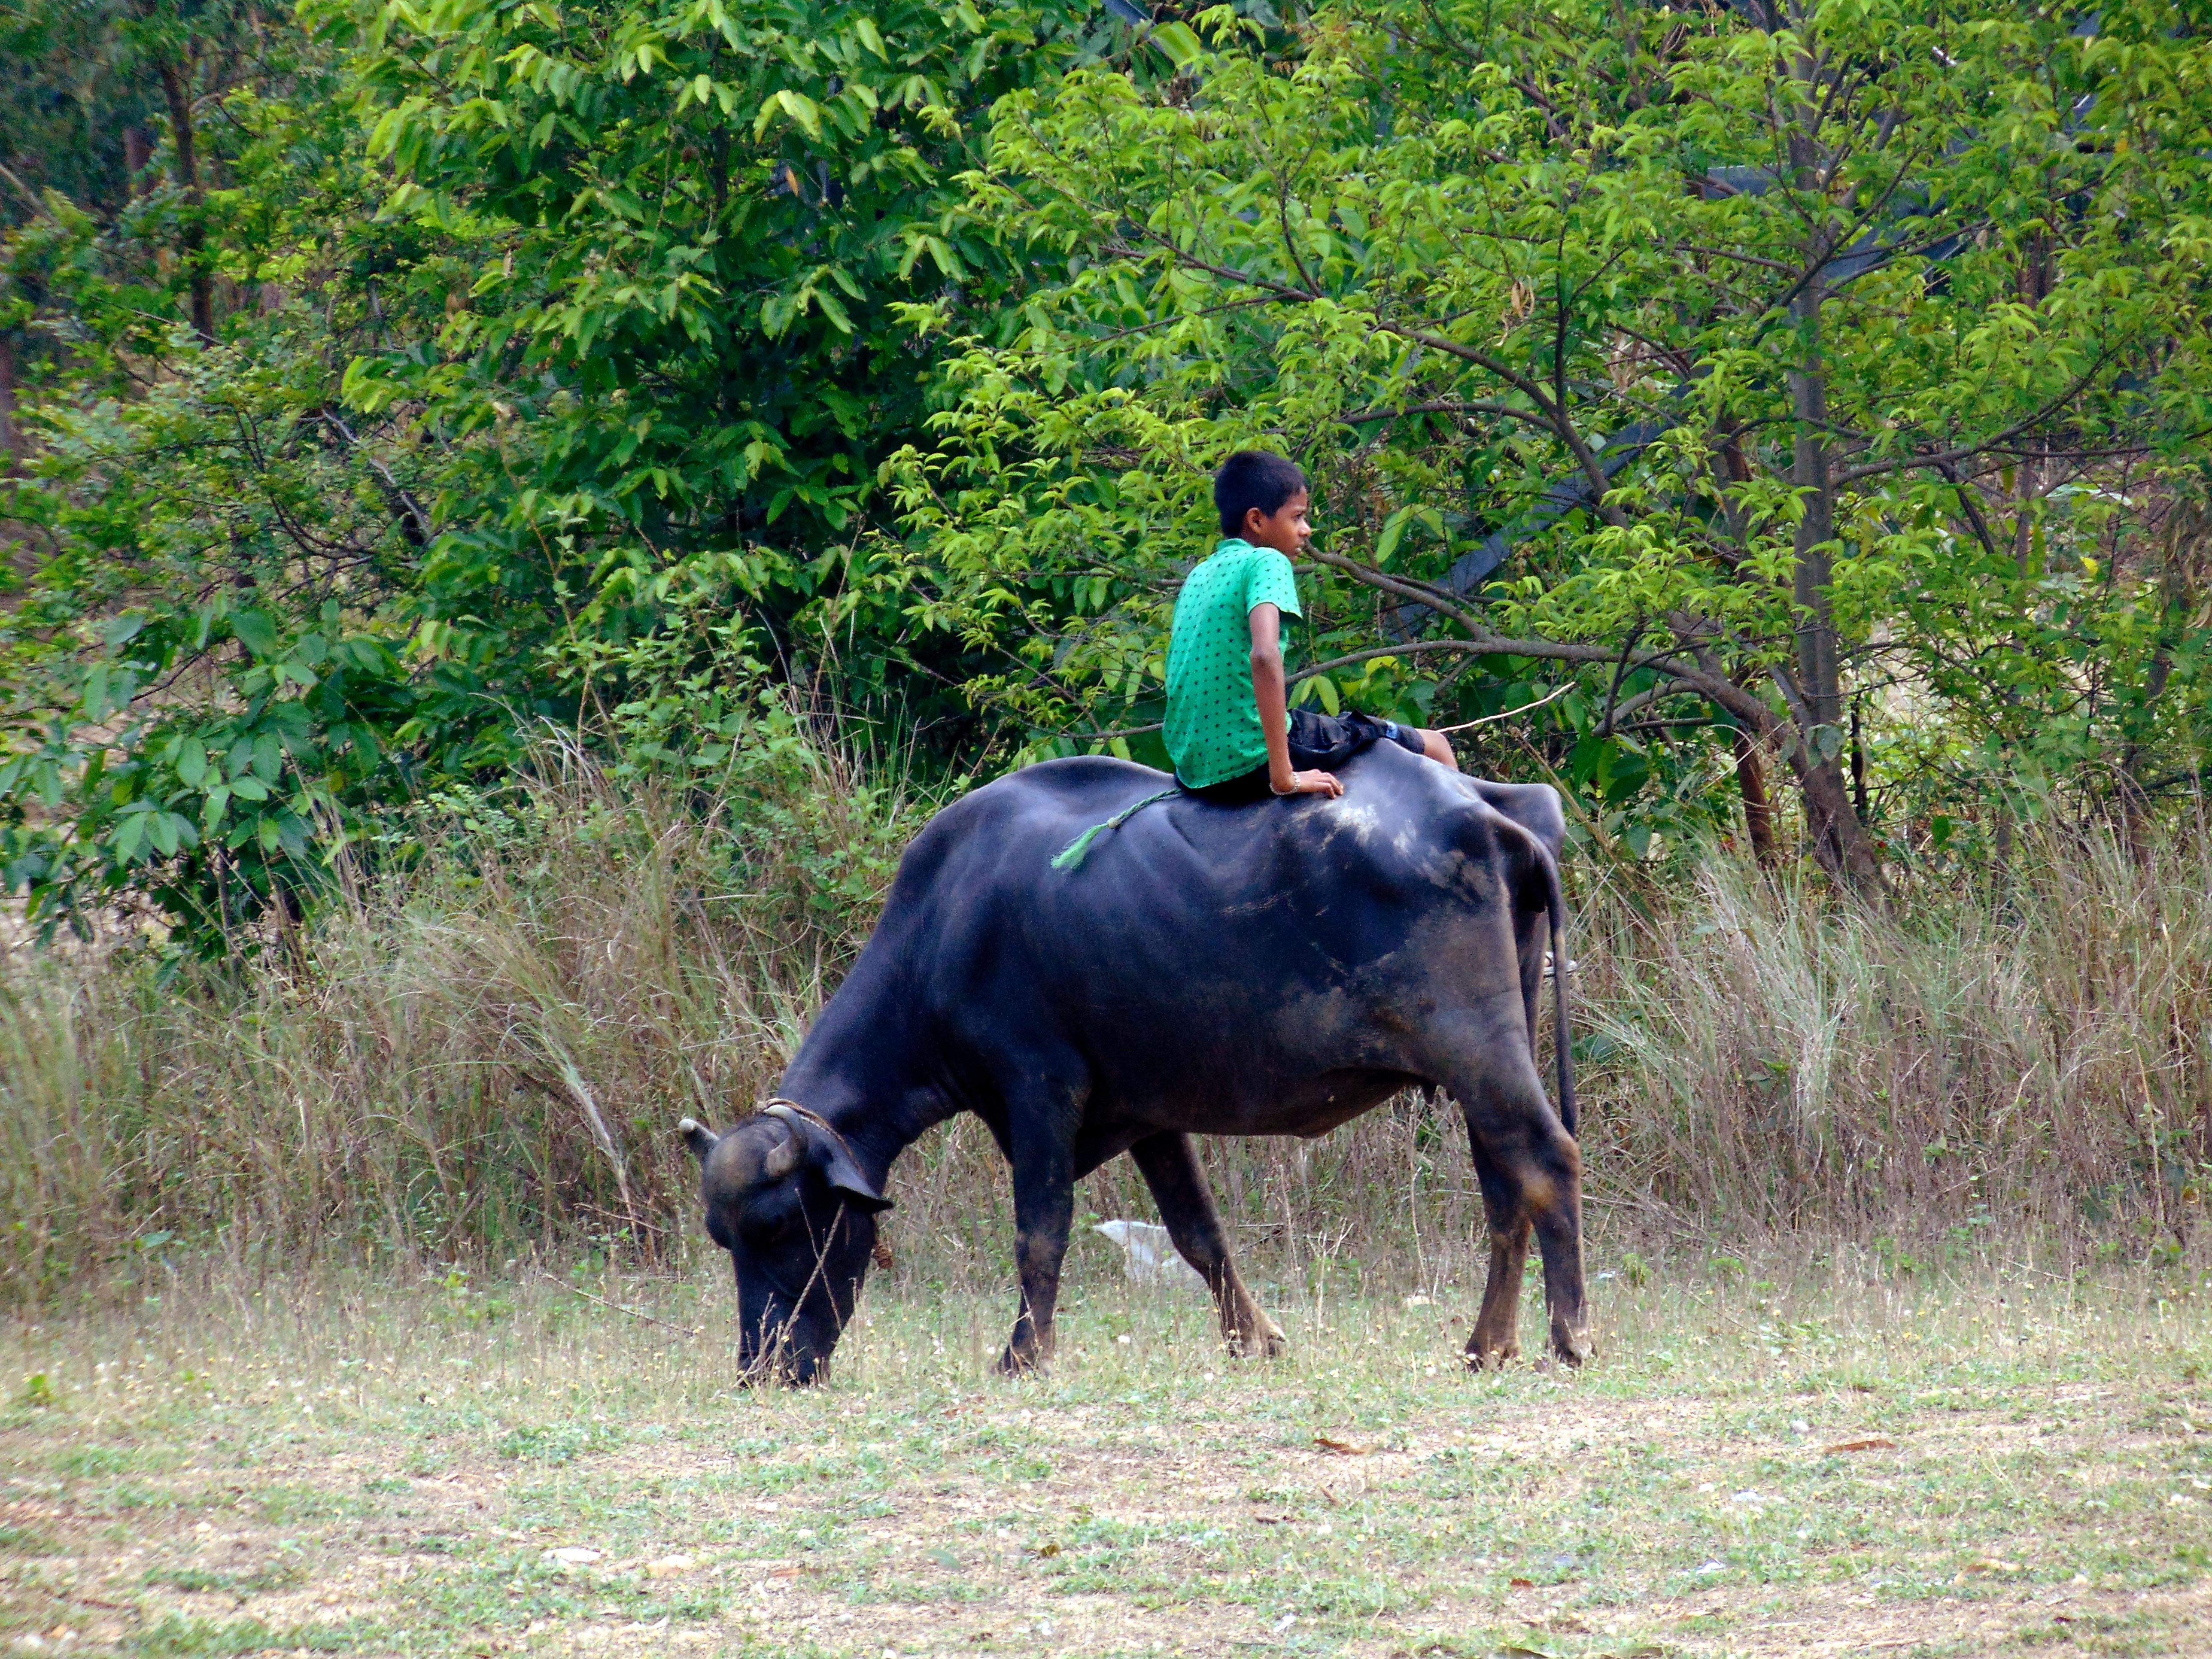 File:Buffalo Ride.jpg - Wikimedia Commons